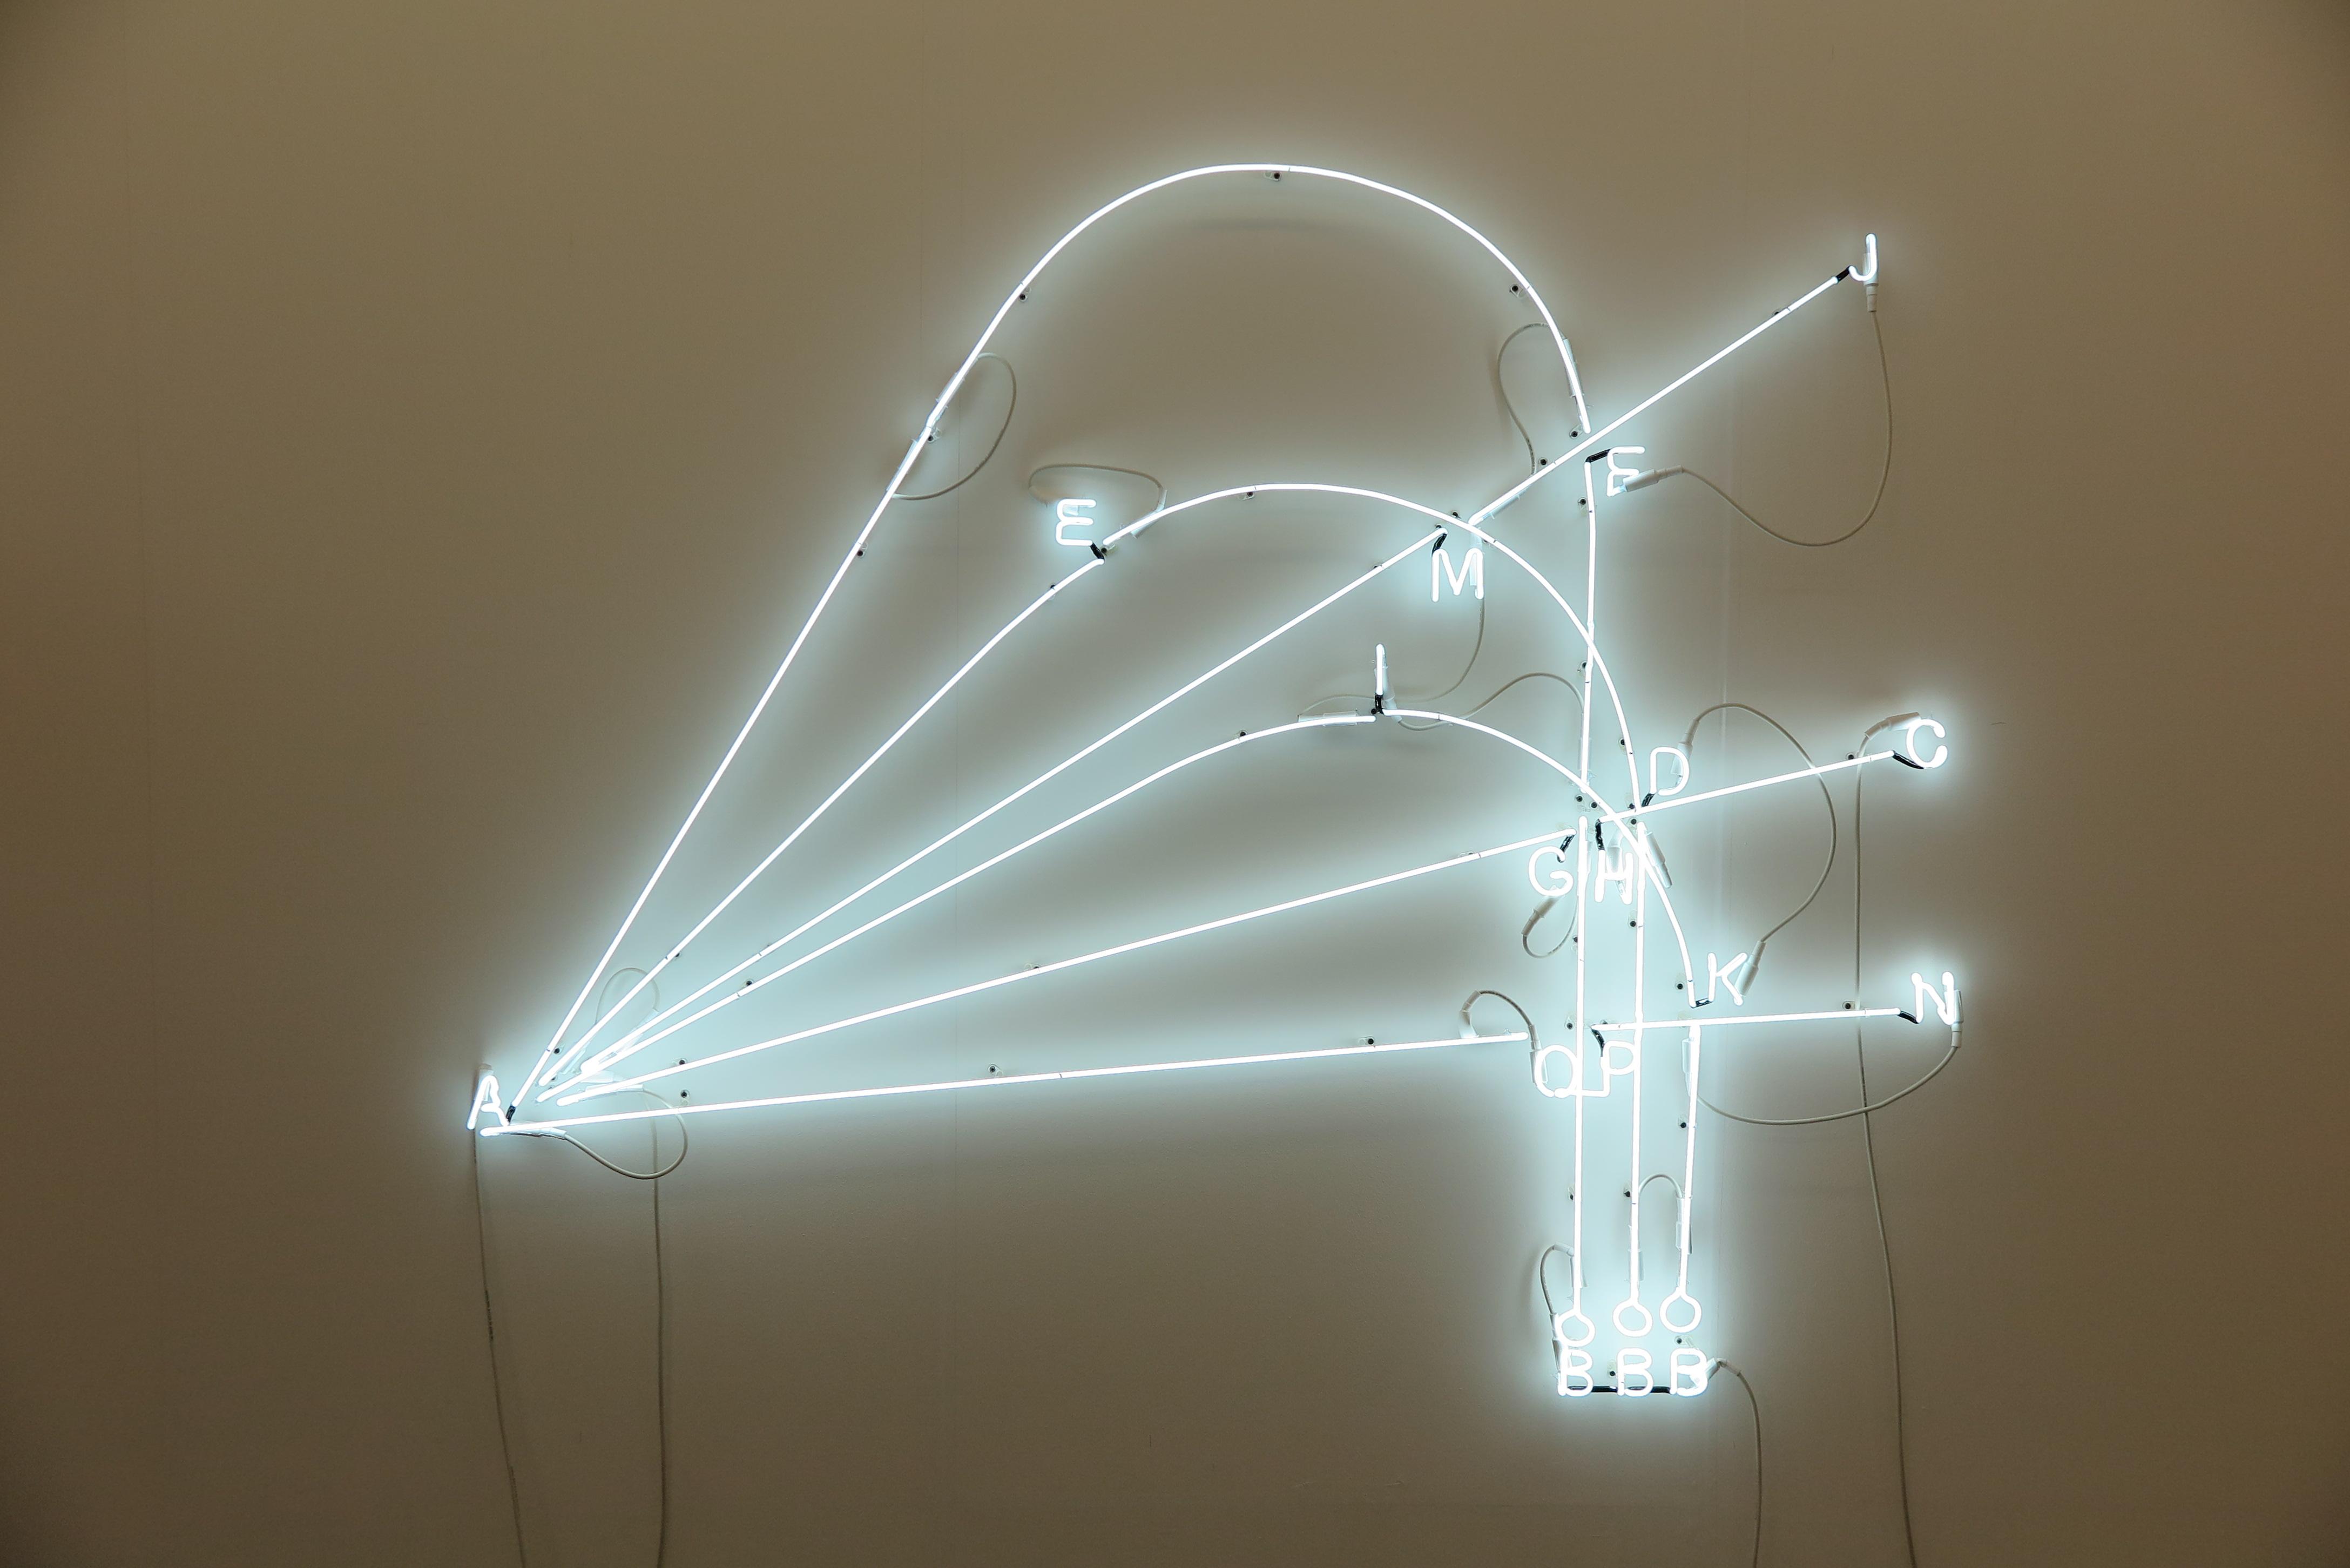 Galerie: Eduardo Secci Contemporary. Kunstenaar: Unknown (Commonities)